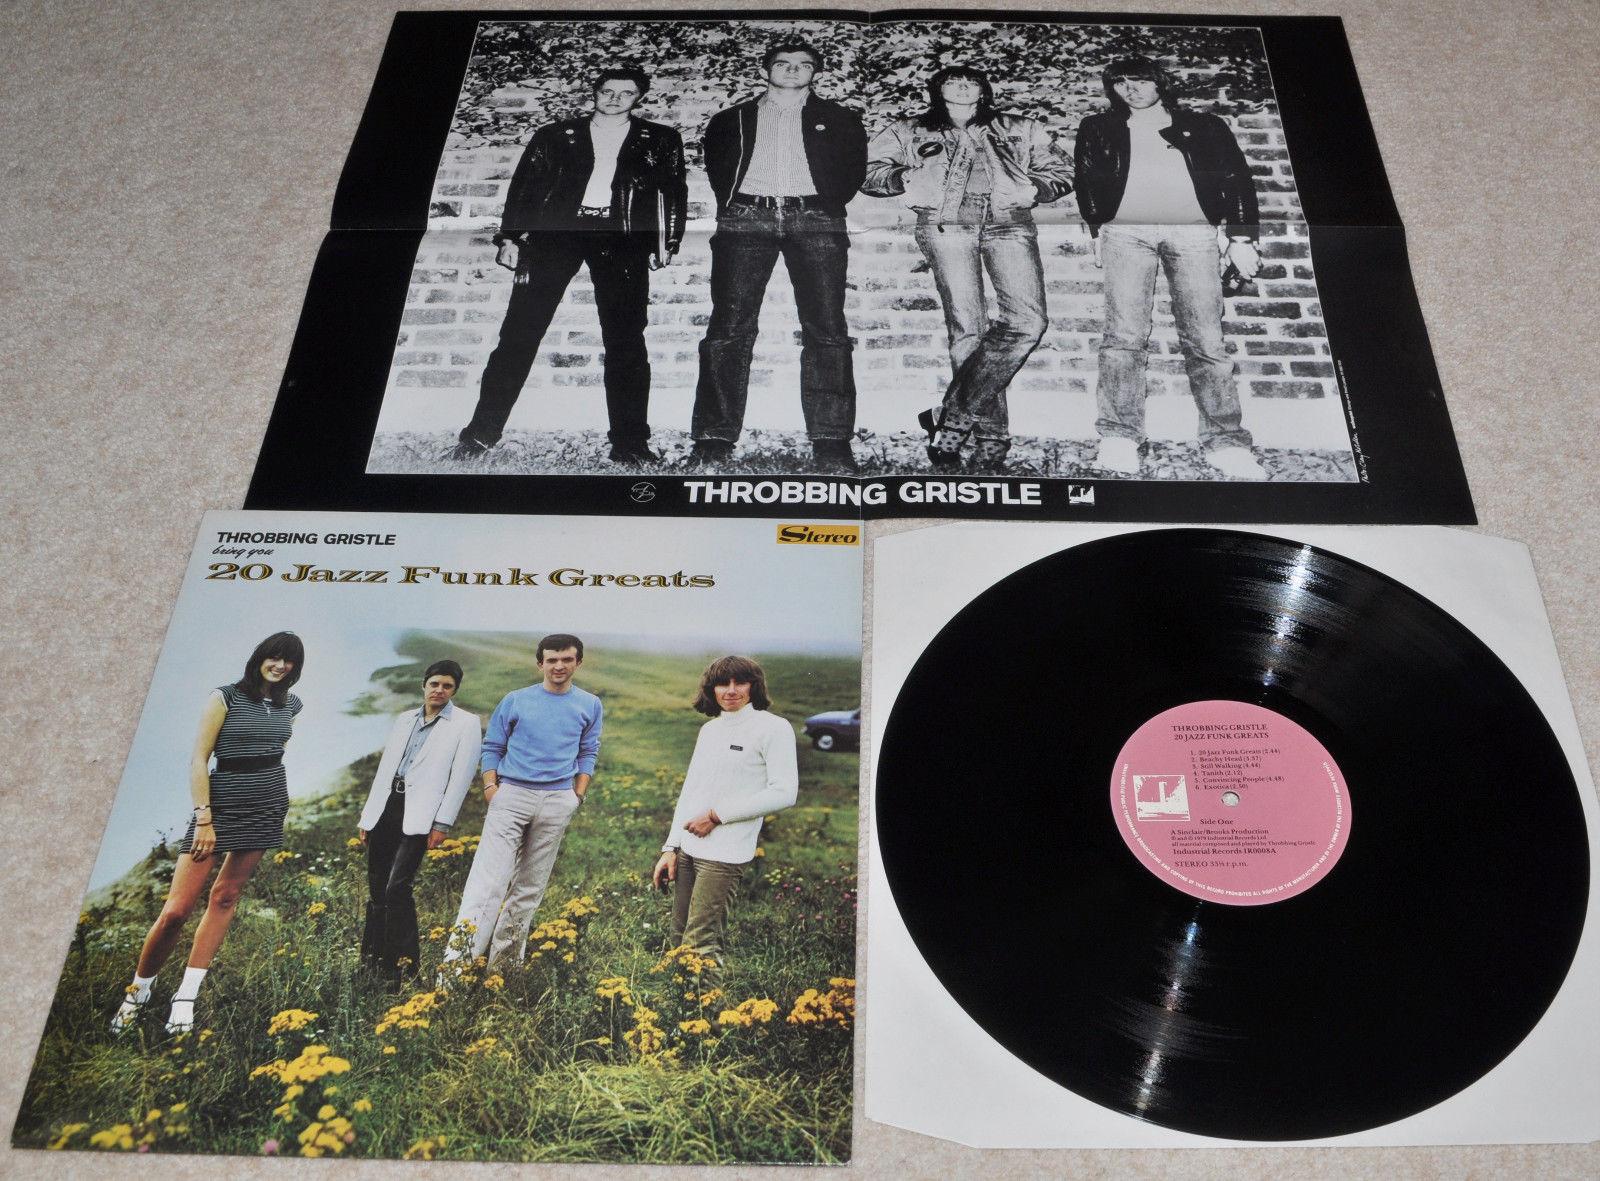 THROBBING GRISTLE 20 Jazz Funk Greats RARE ORIG UK 79 NEAR MINT LP + N/M POSTER.